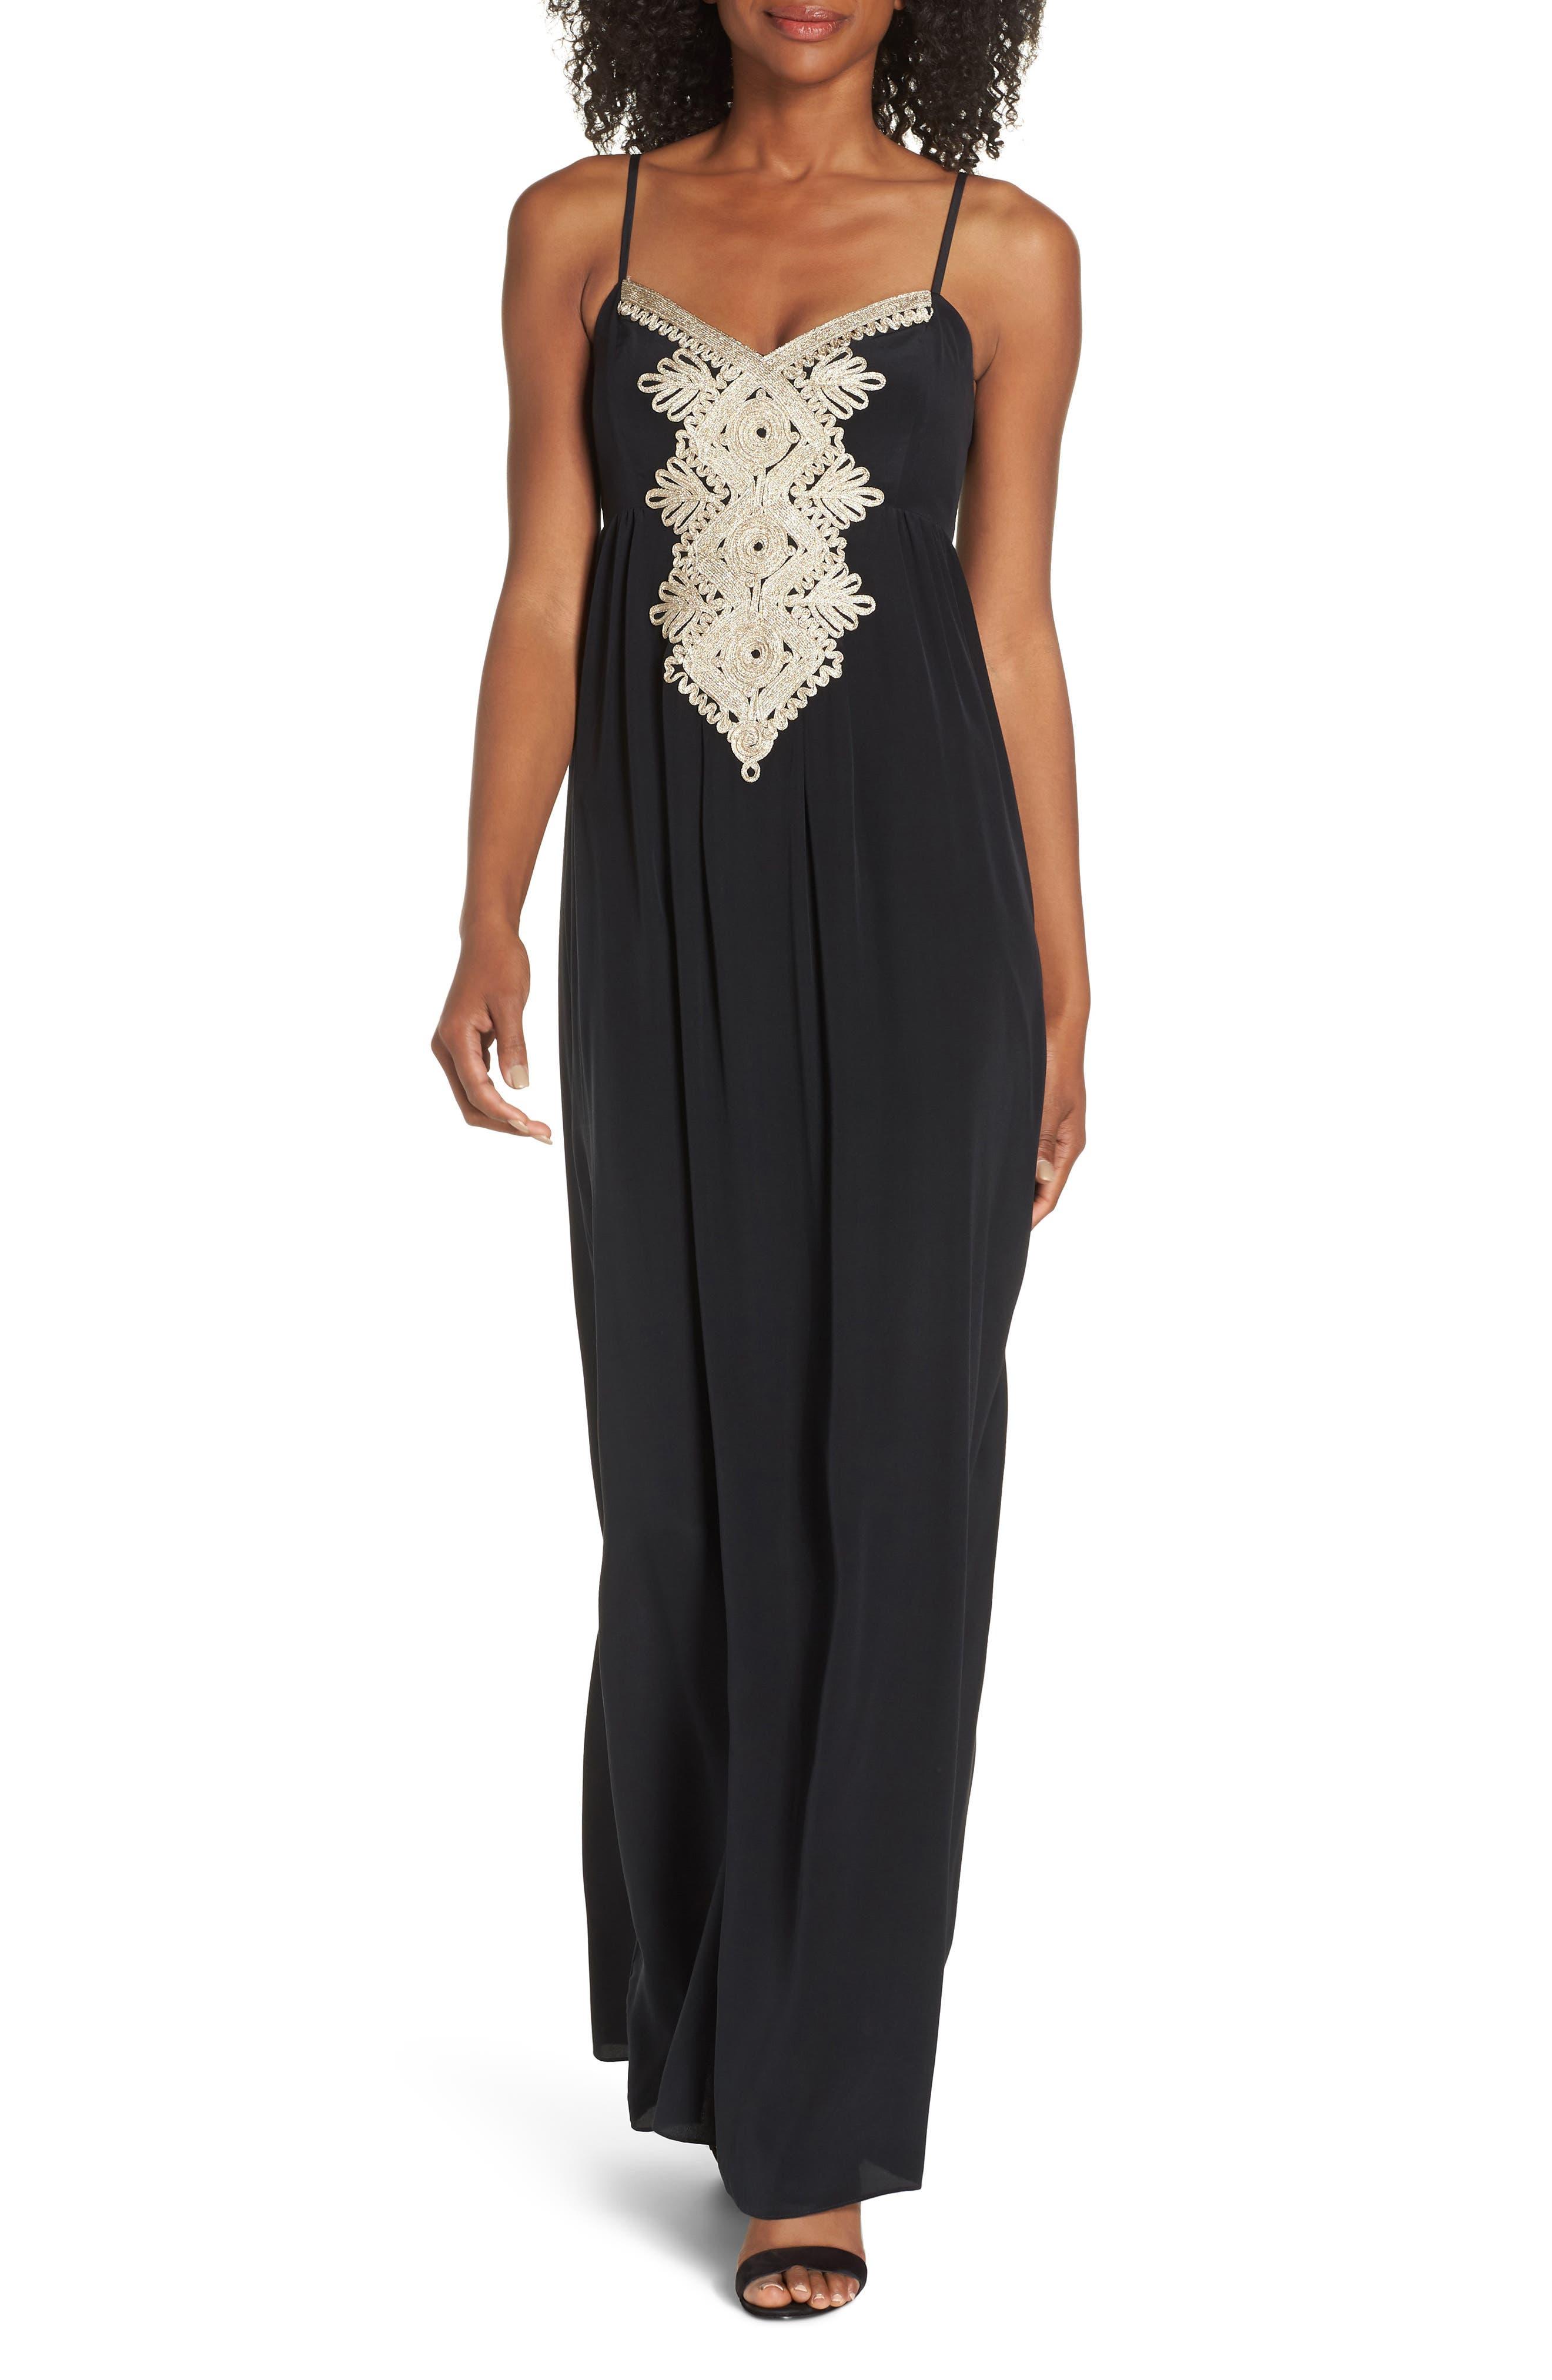 Lilly Pulitzer Kelsea Silk Maxi Dress, Black